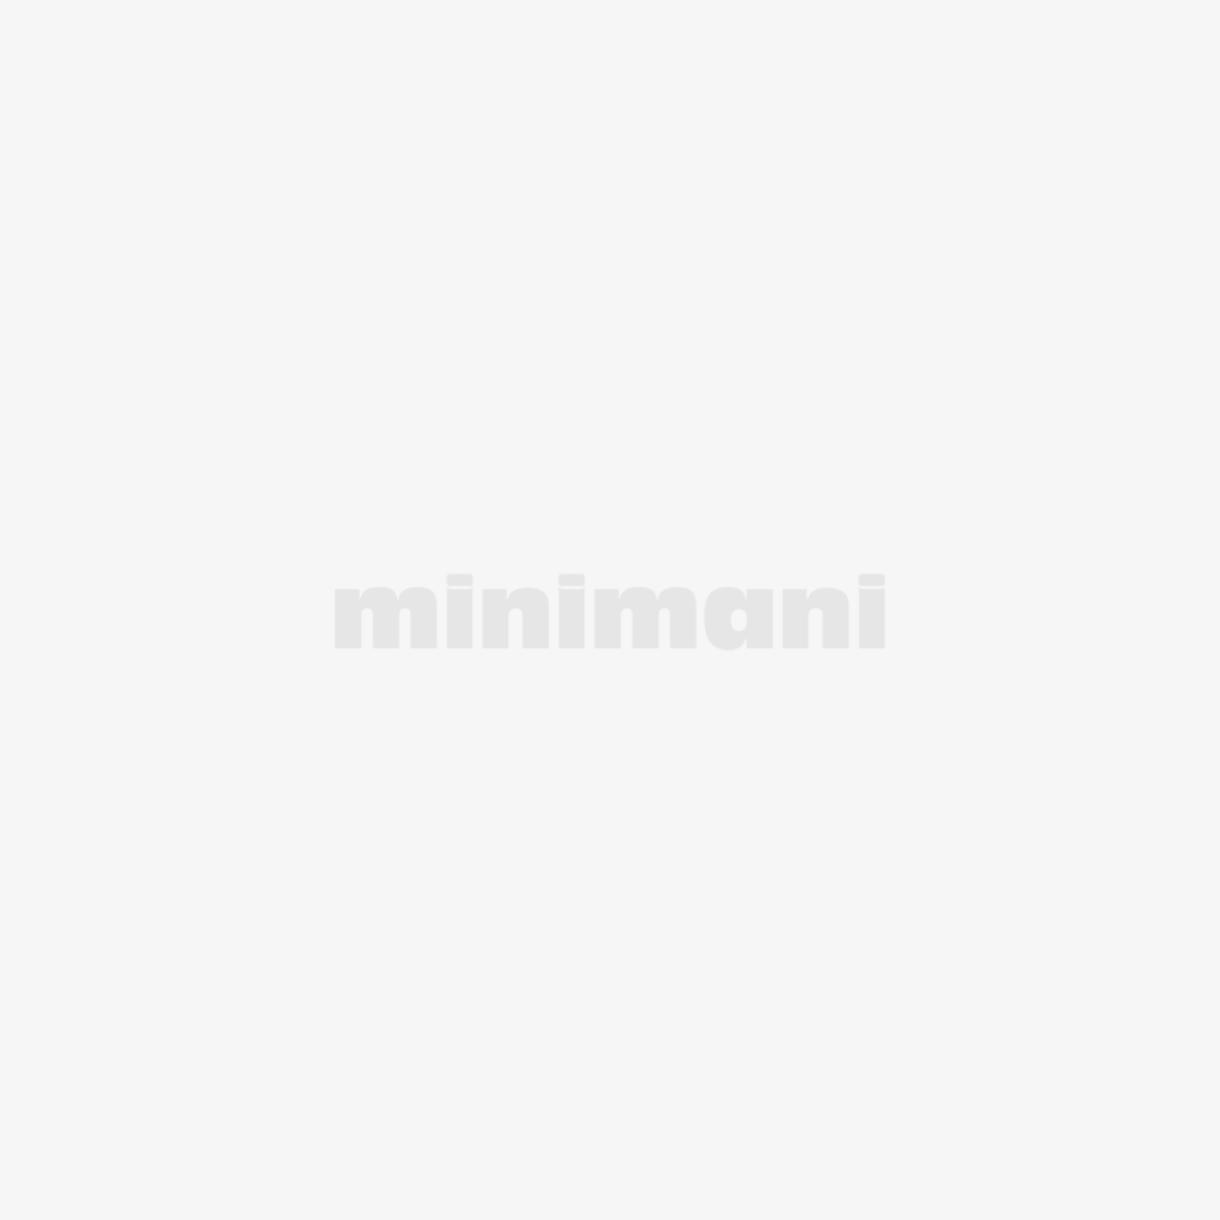 M-FILTER RAITISILMASUODATIN MAC 8058 S40 I 95-04 / V40